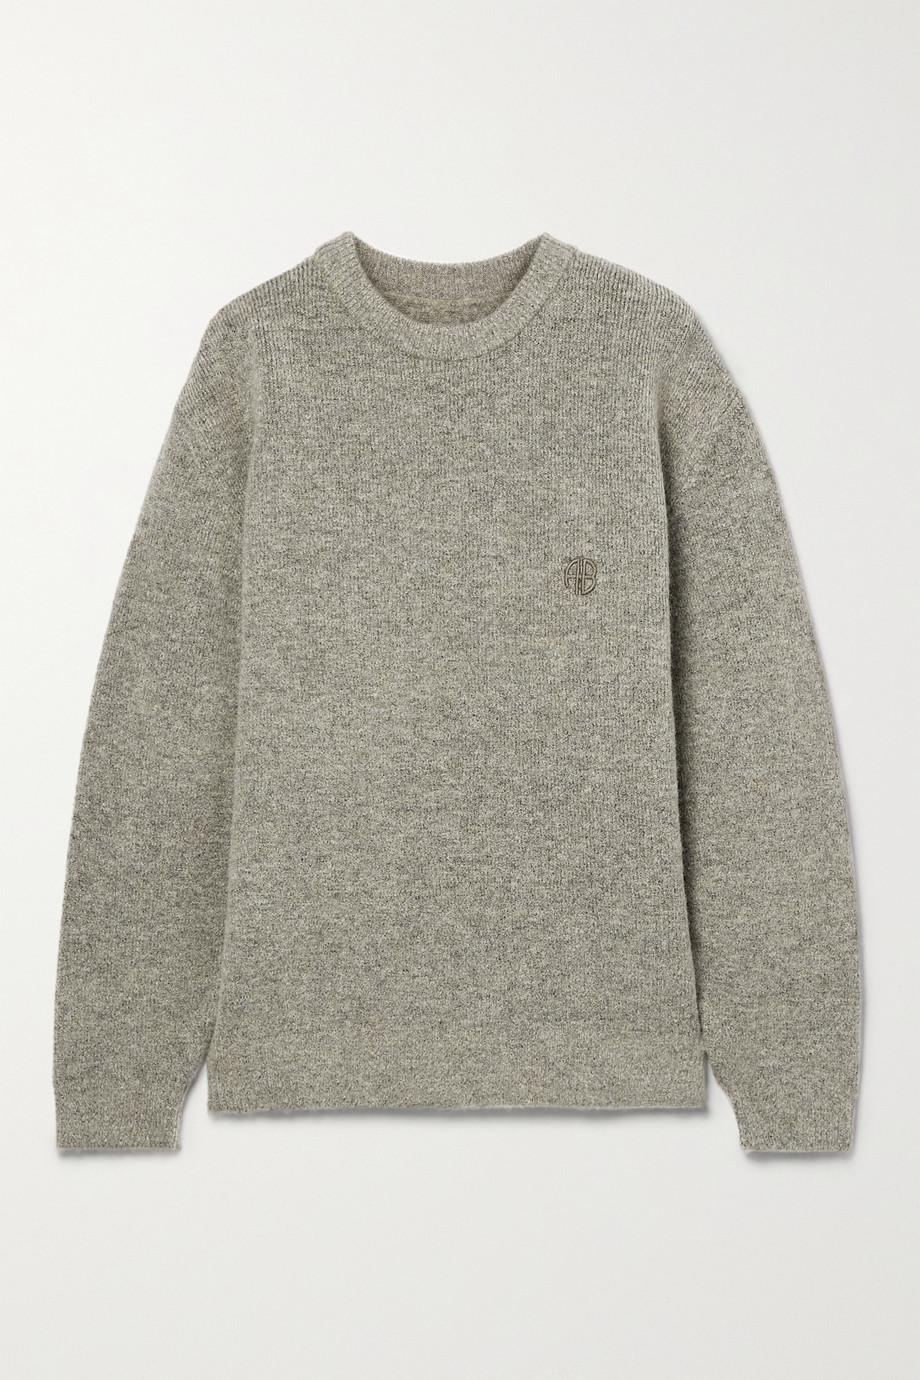 Anine Bing Ramona knitted sweater